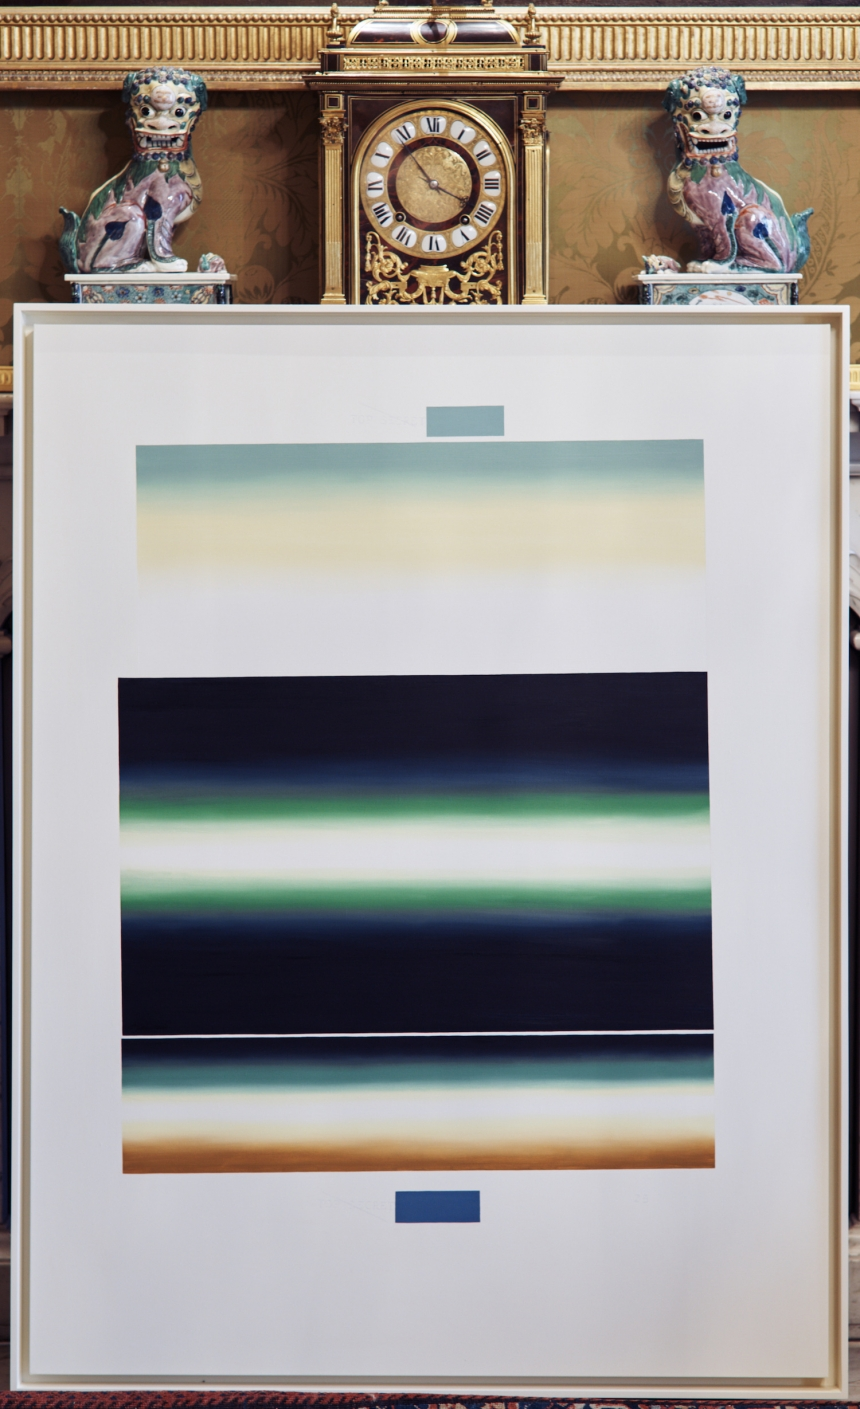 TOP SECRET 25 , 2012. U.S. government document SOFTER: Jenny Holzer at Blenheim Palace , Blenheim Palace, Woodstock, UK, 2017 © 2017 Jenny Holzer, member Artists Rights Society (ARS), NY Photo: Edd Horder